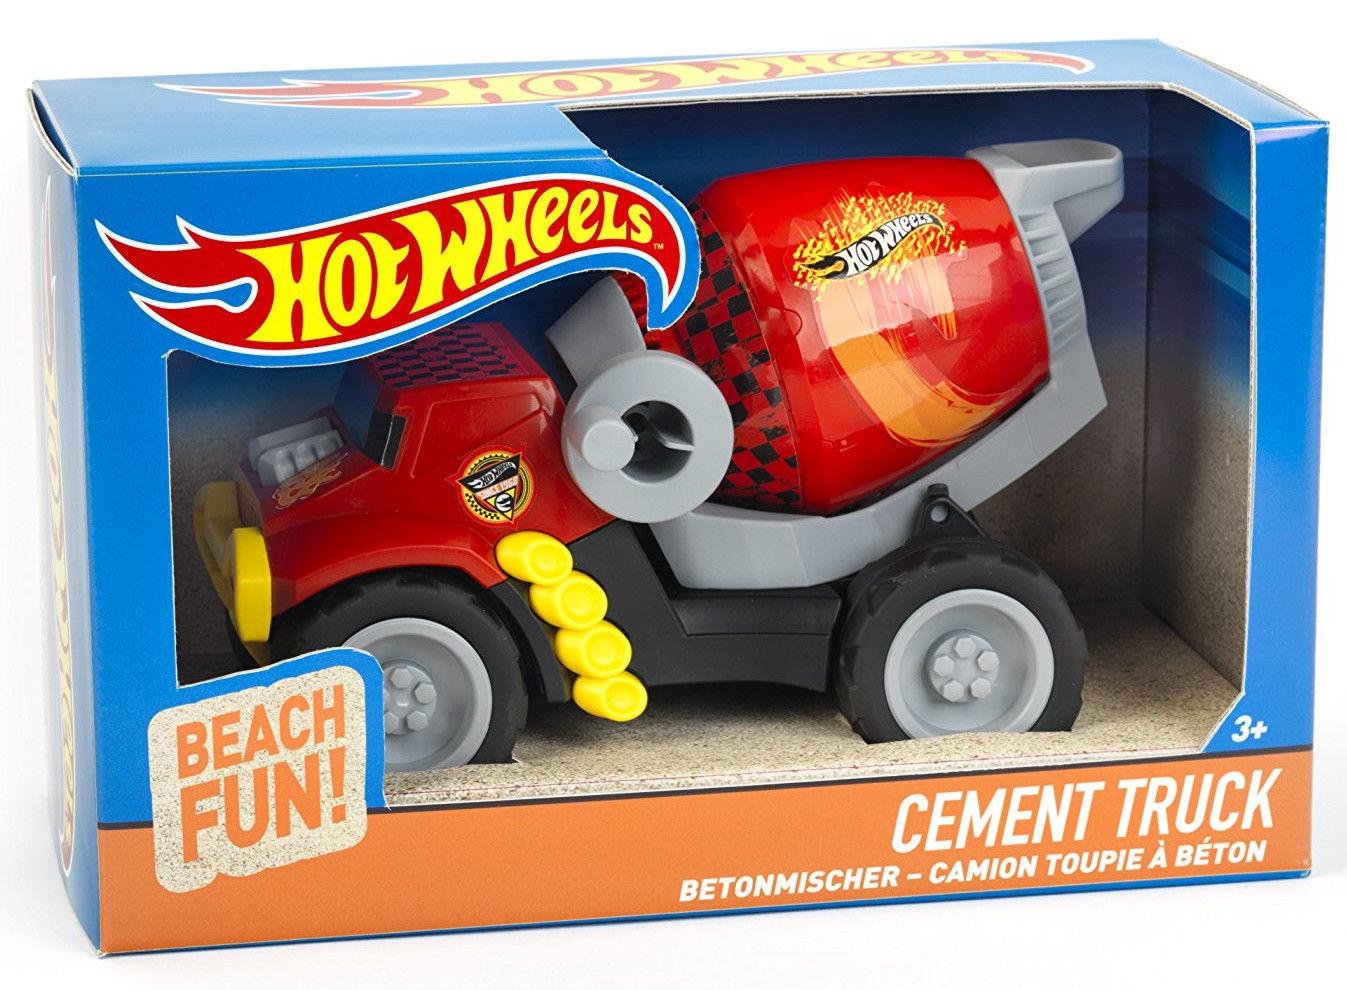 22017b247aa Klein Hot Wheels Cement Truck 2447 - Krauta.ee